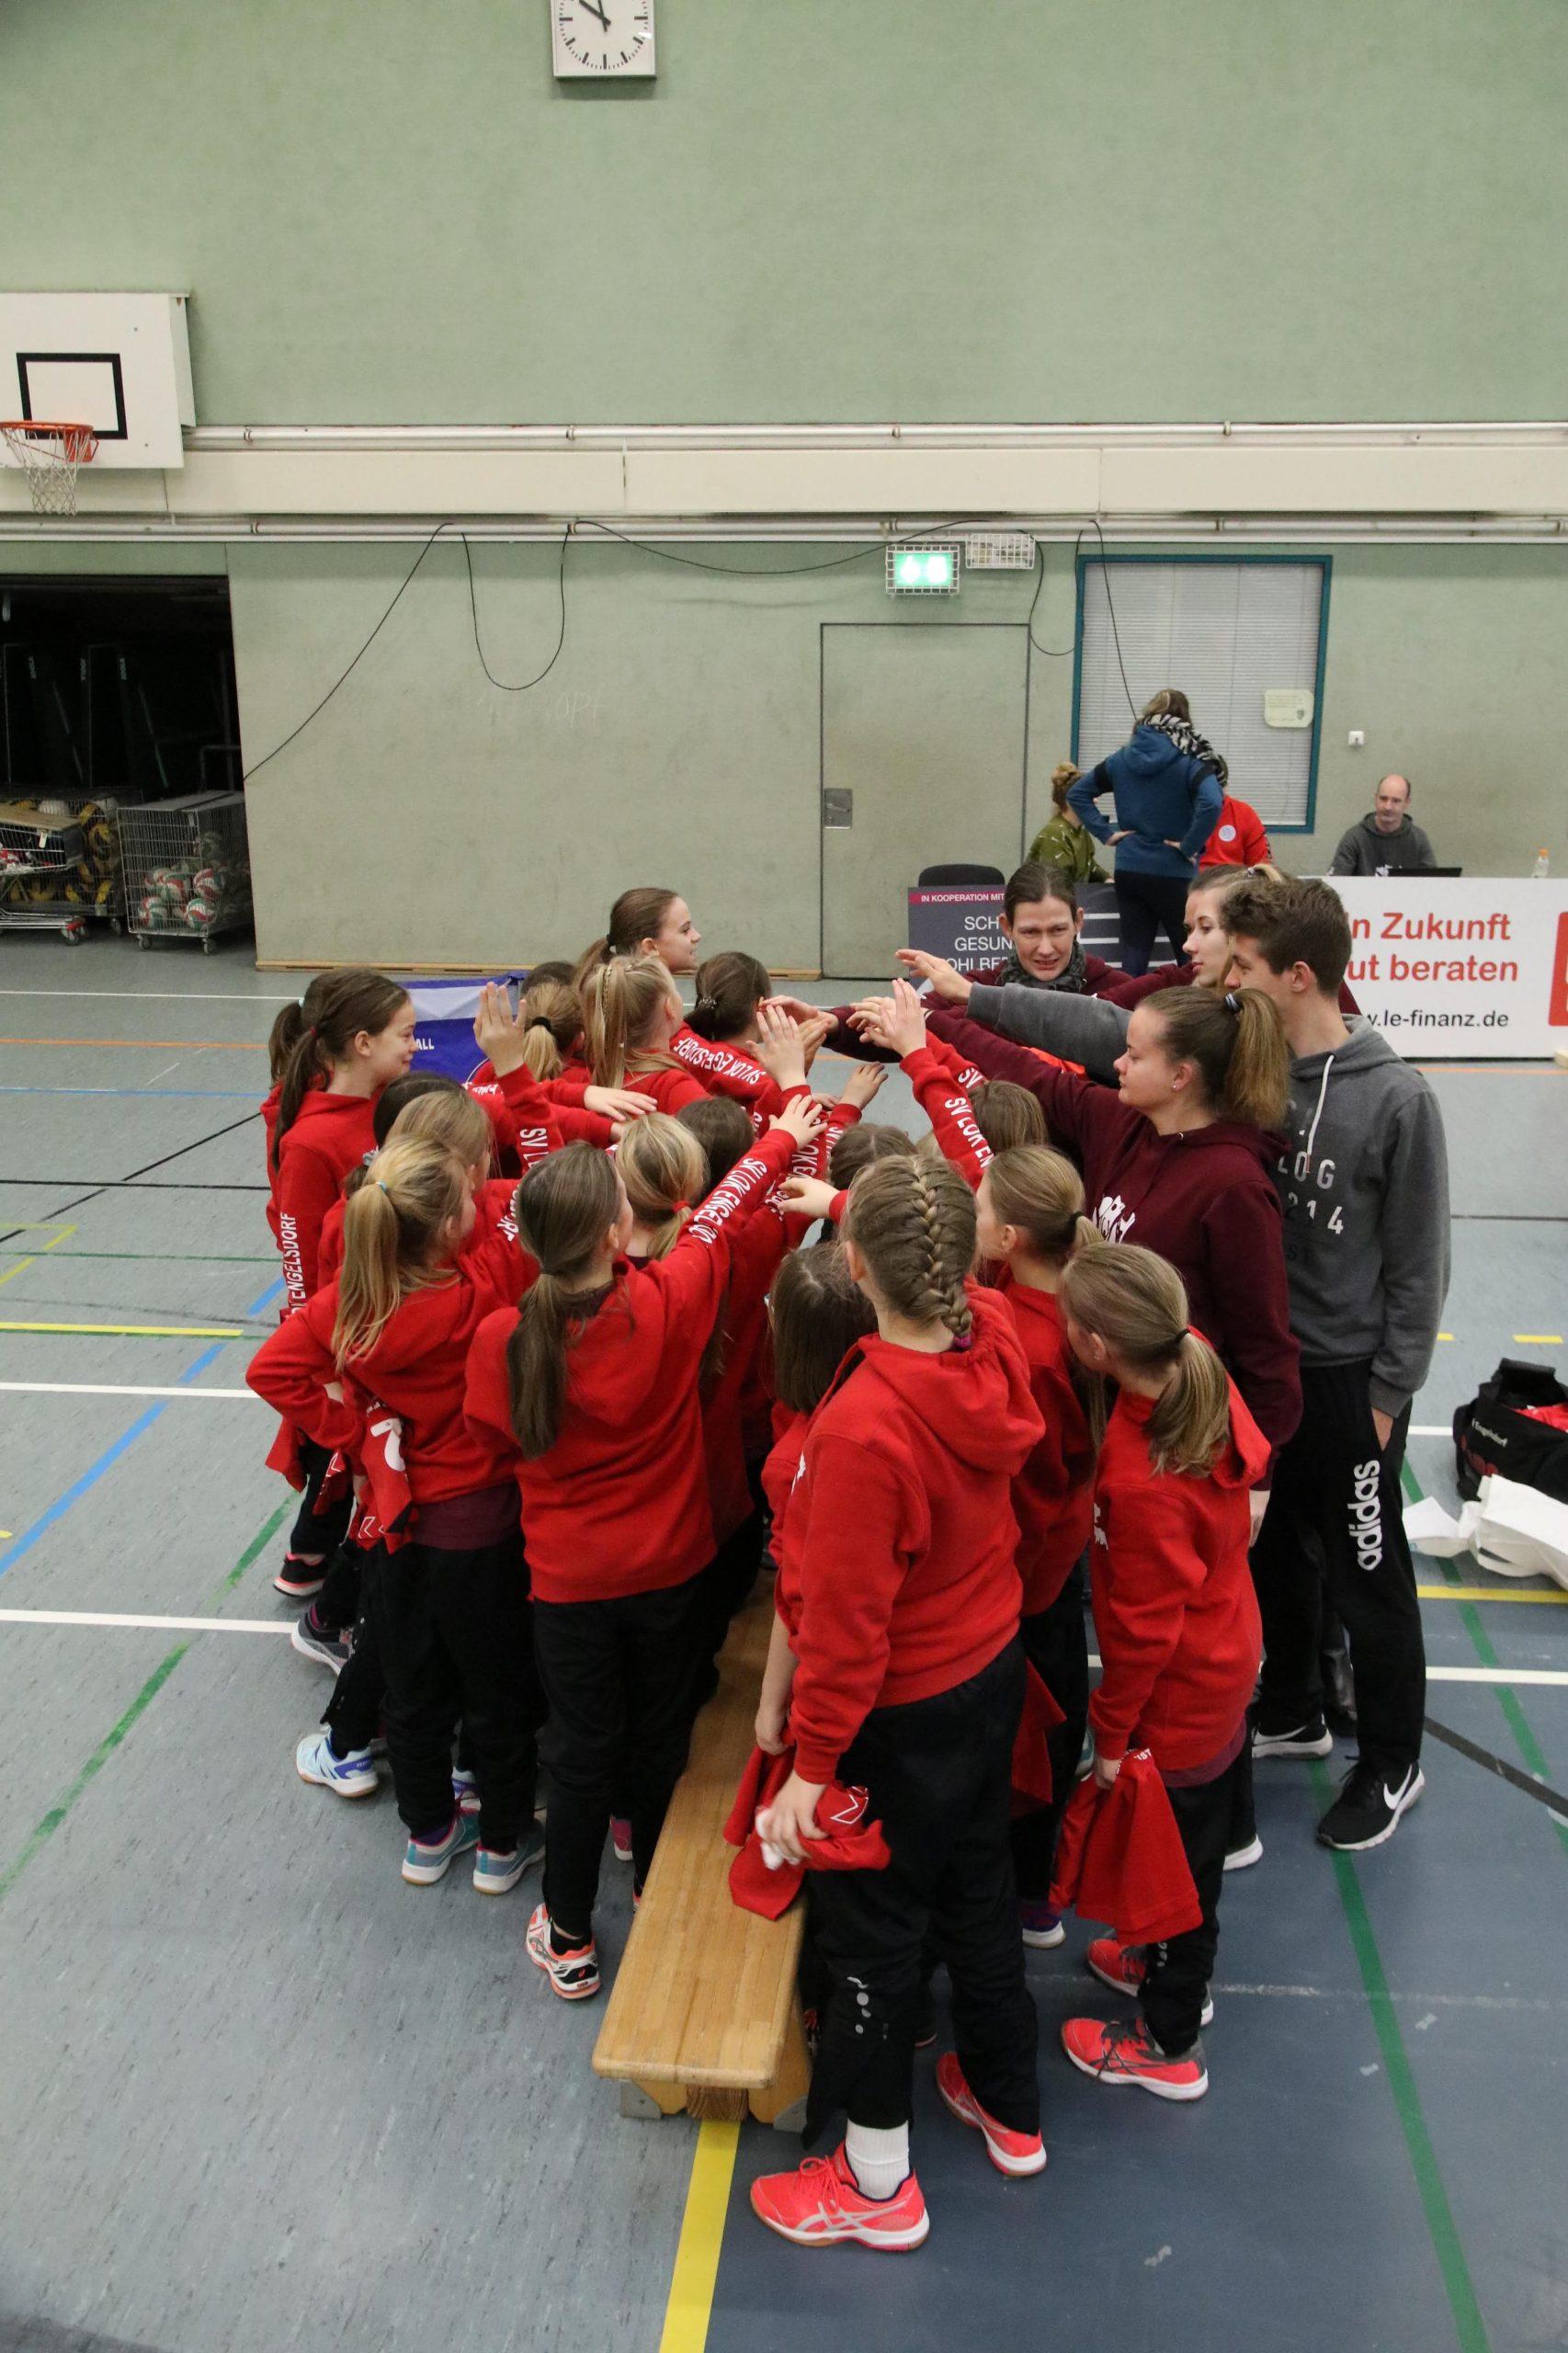 Bezirksmeisterschaft U12 – 2. Finalrunde – Engelsdorf mit sechs Mannschaften am Start